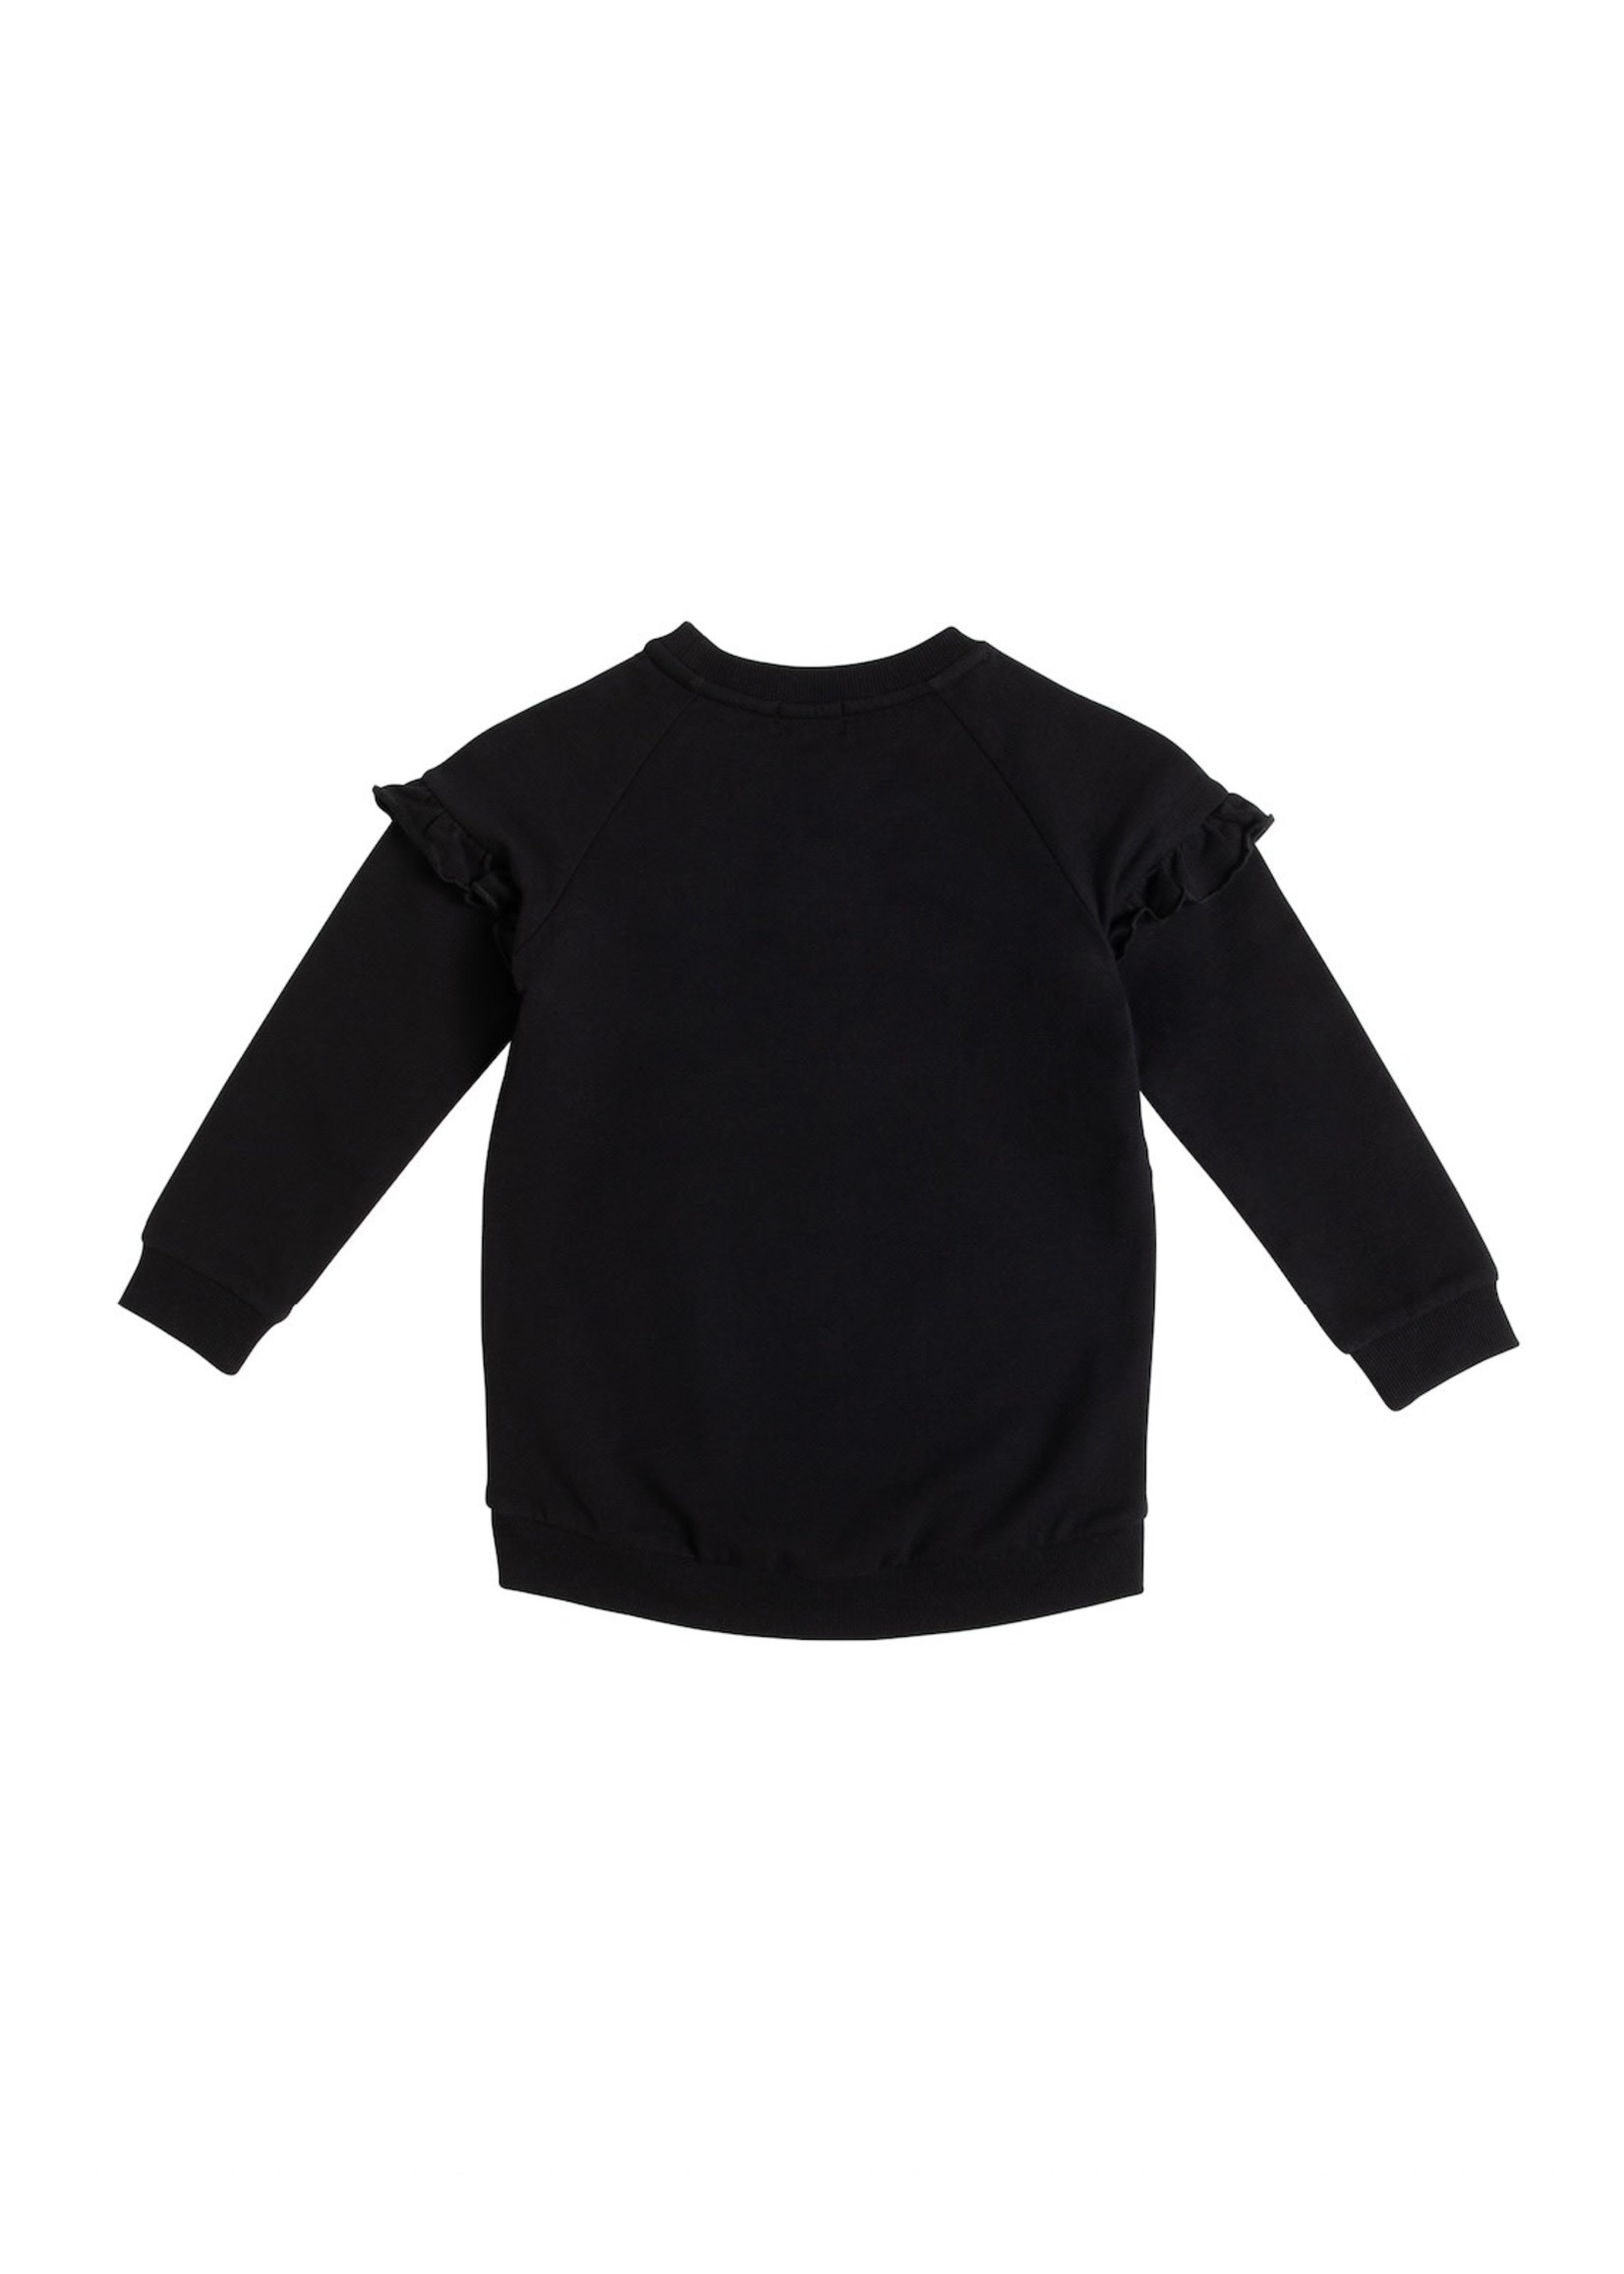 Miles Baby Miles Black Band Girls Sweatshirt